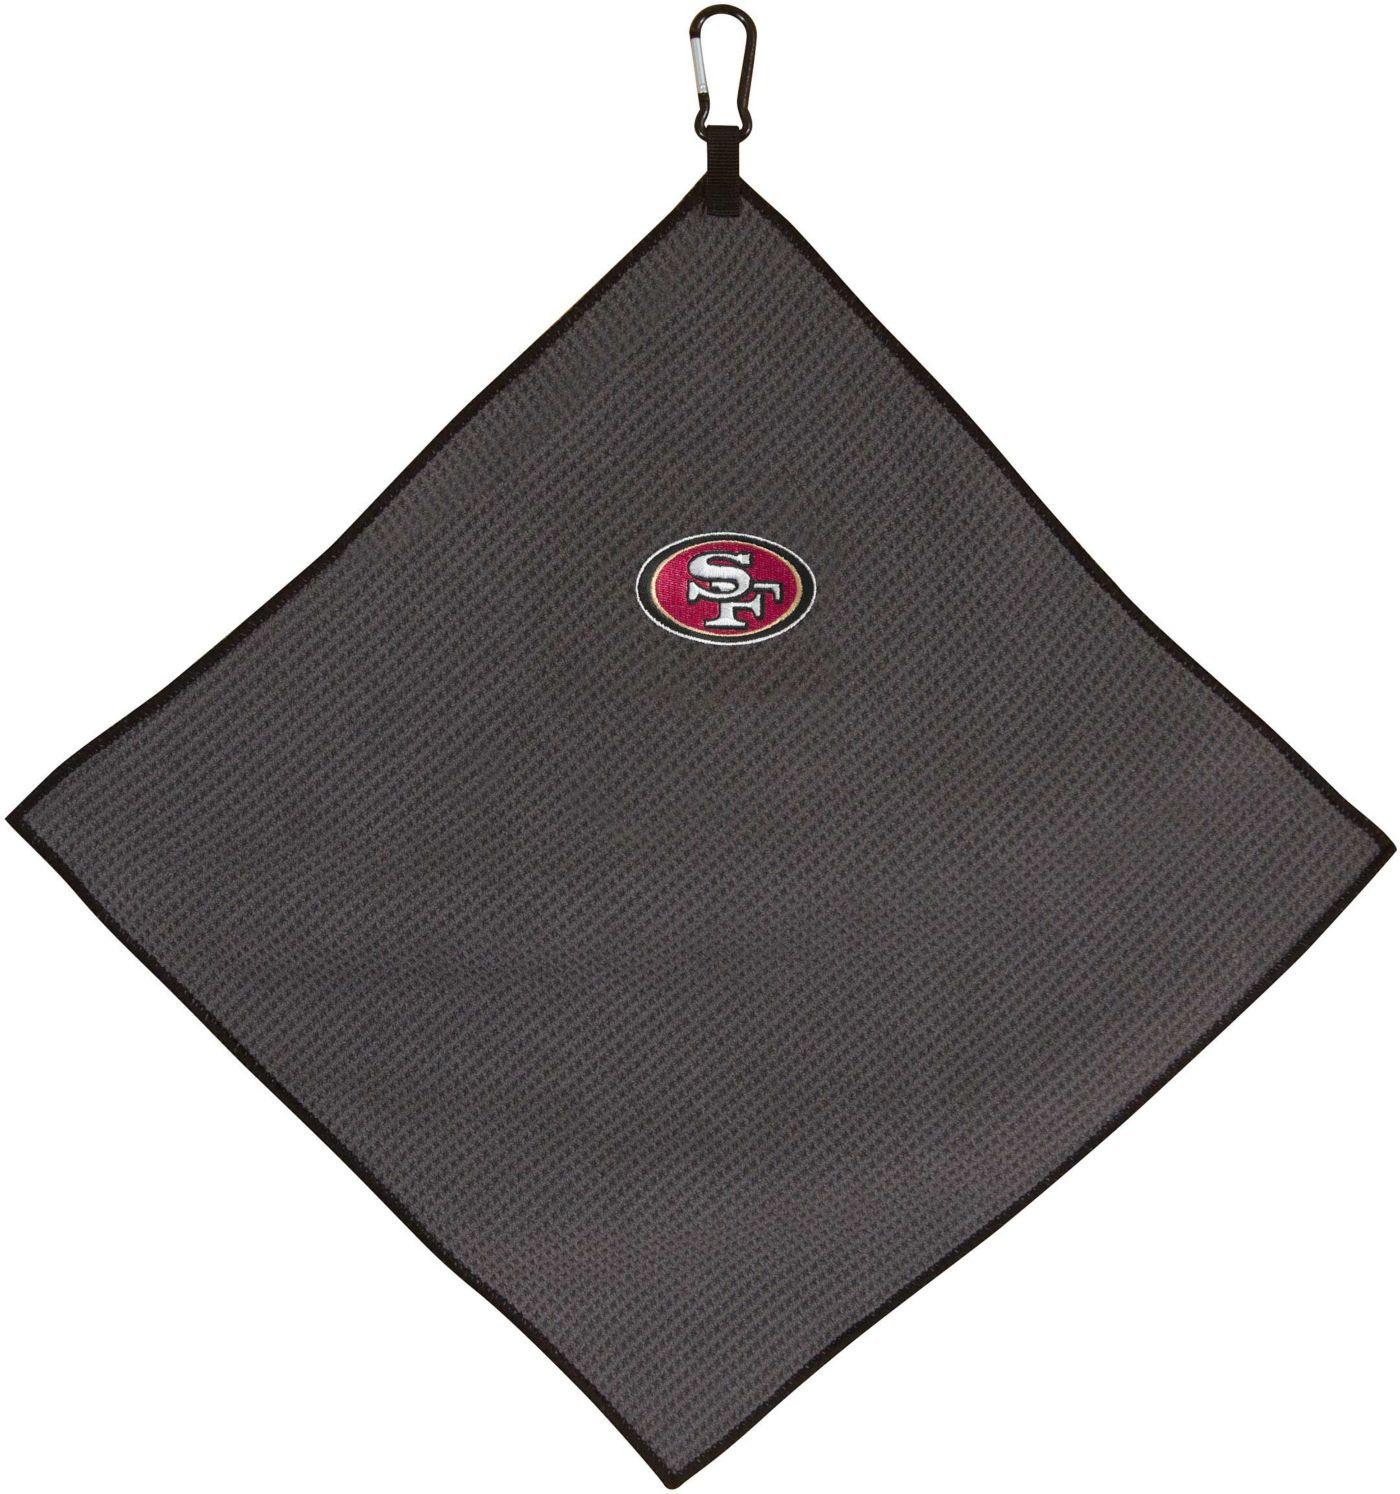 "Team Effort San Francisco 49ers 15"" x 15"" Microfiber Golf Towel"